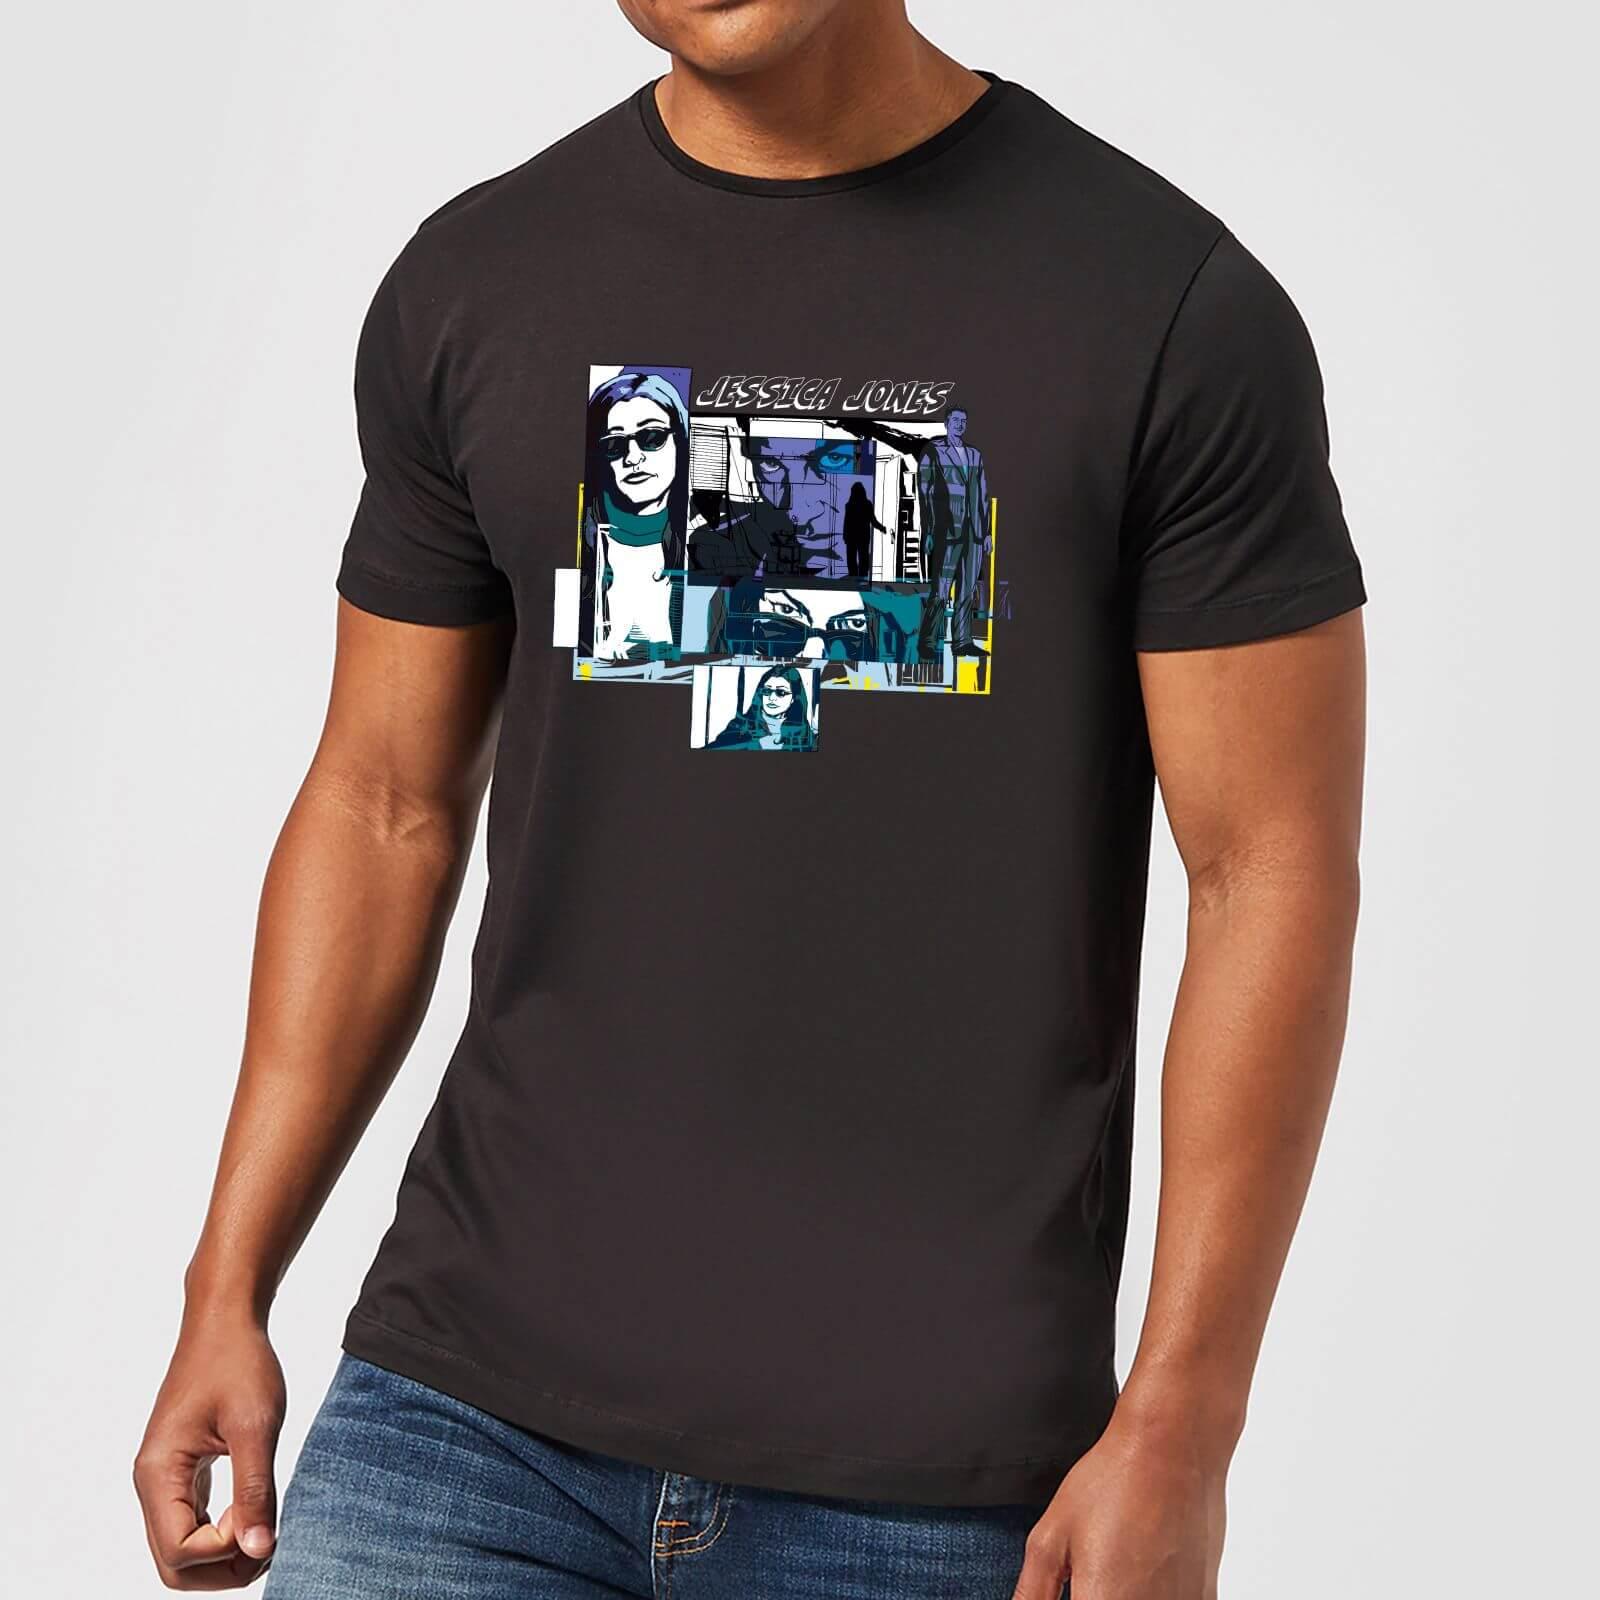 OfferteWeb.click 40-t-shirt-marvel-knights-jessica-jones-comic-panels-nero